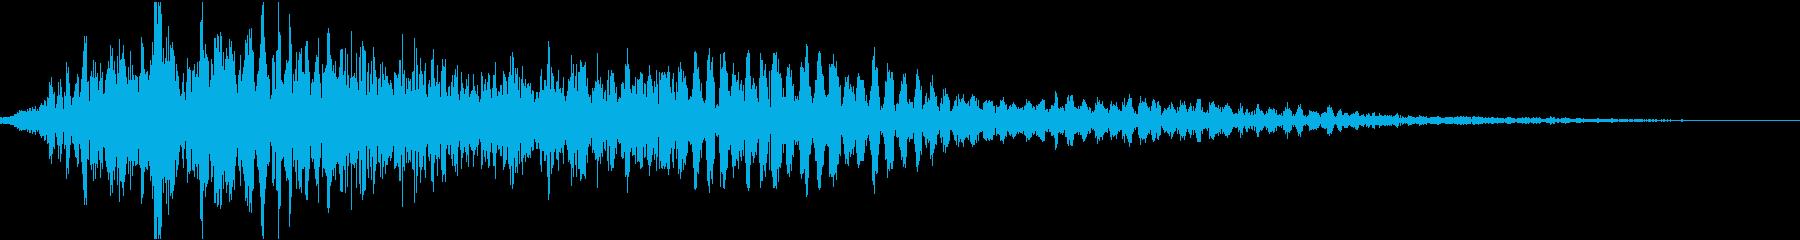 CINEMATIC SFX_14の再生済みの波形